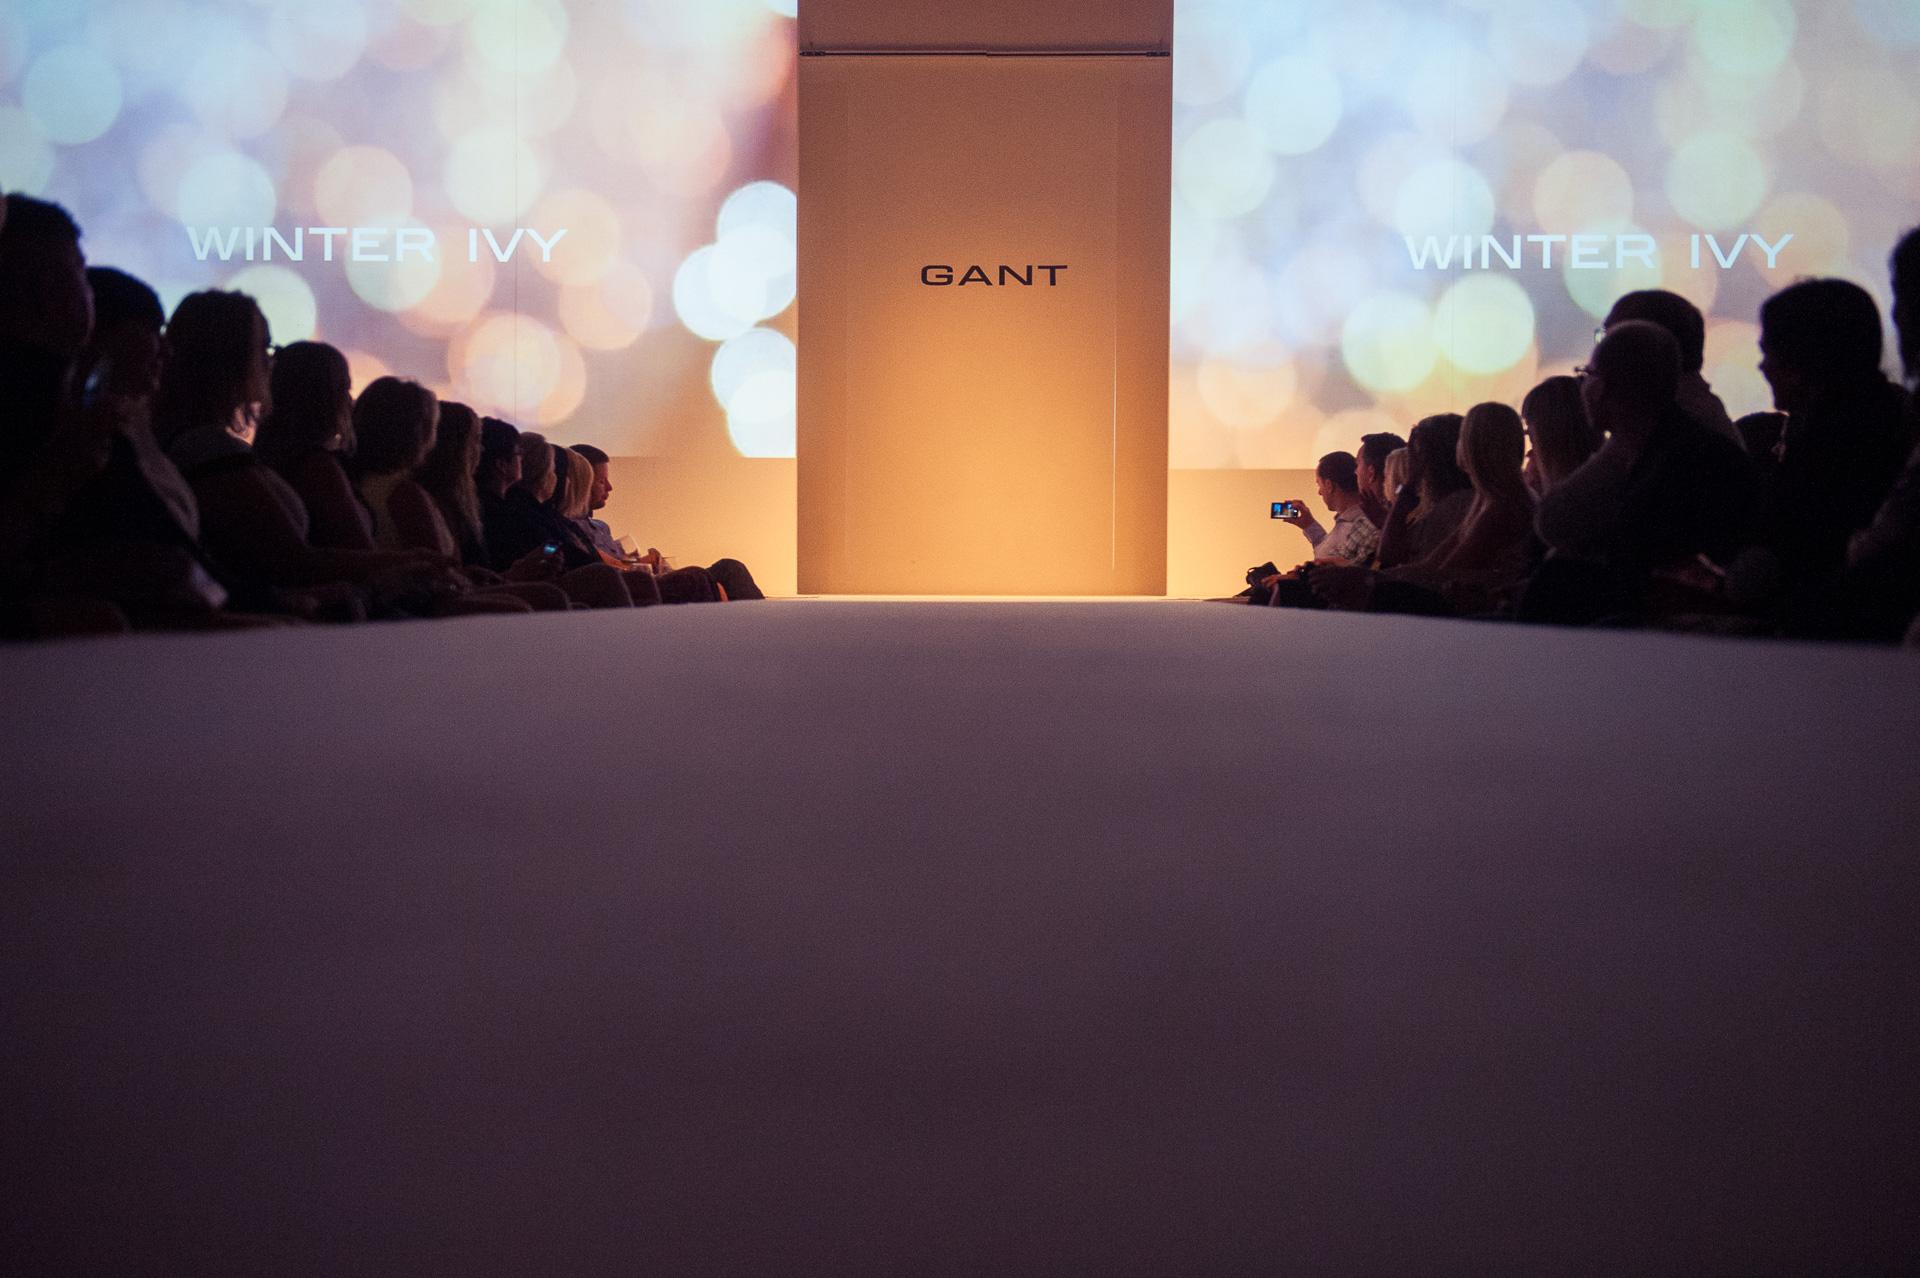 Gant vnesl do galerie Mánes pohodu